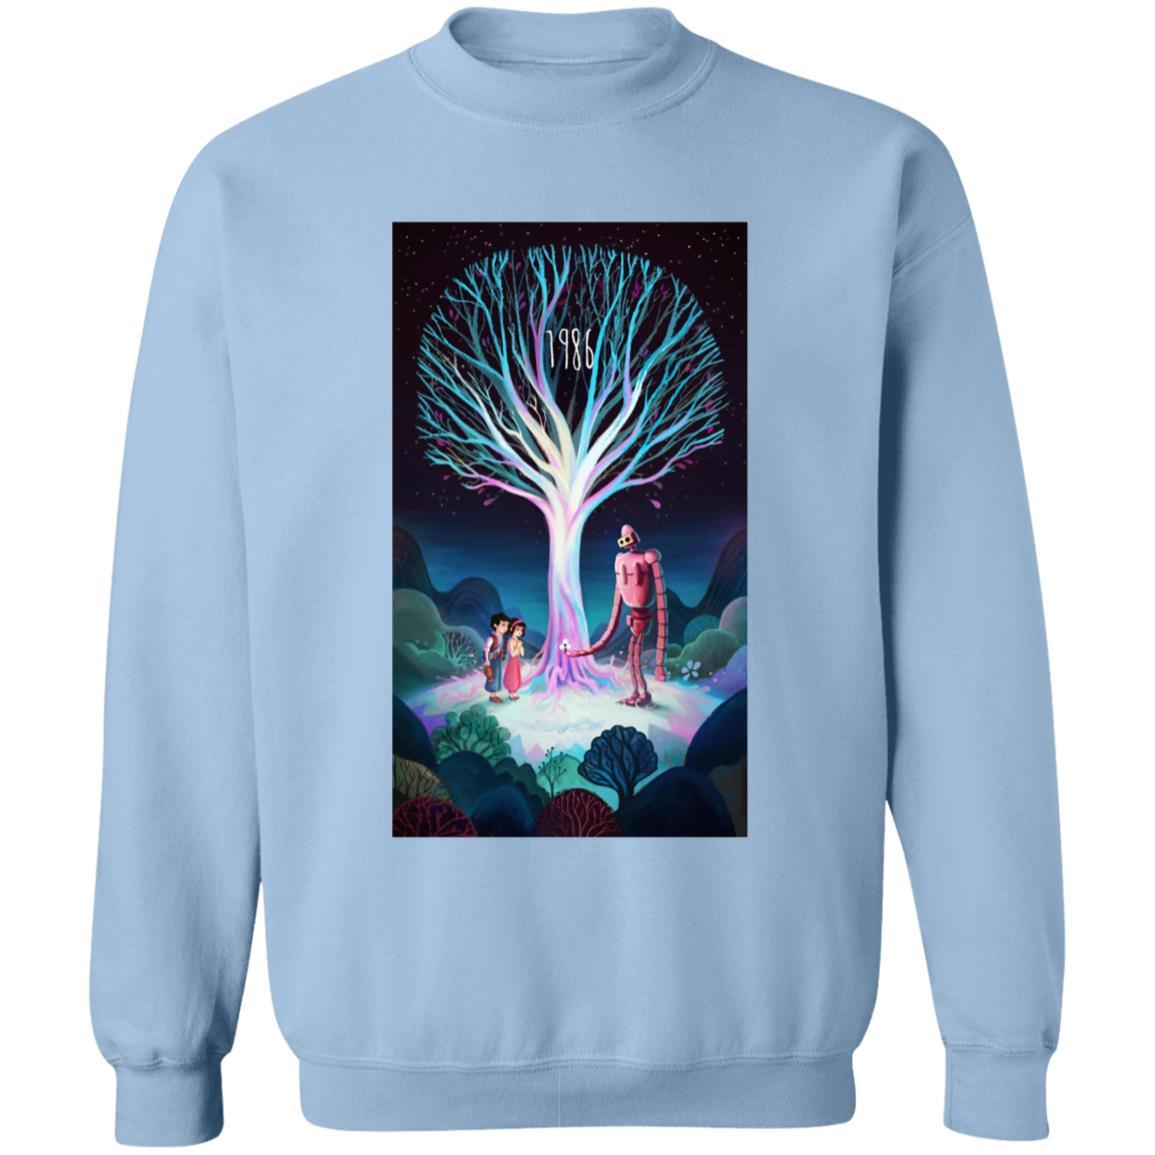 Laputa: Castle in The Sky 1986 Illustration Sweatshirt